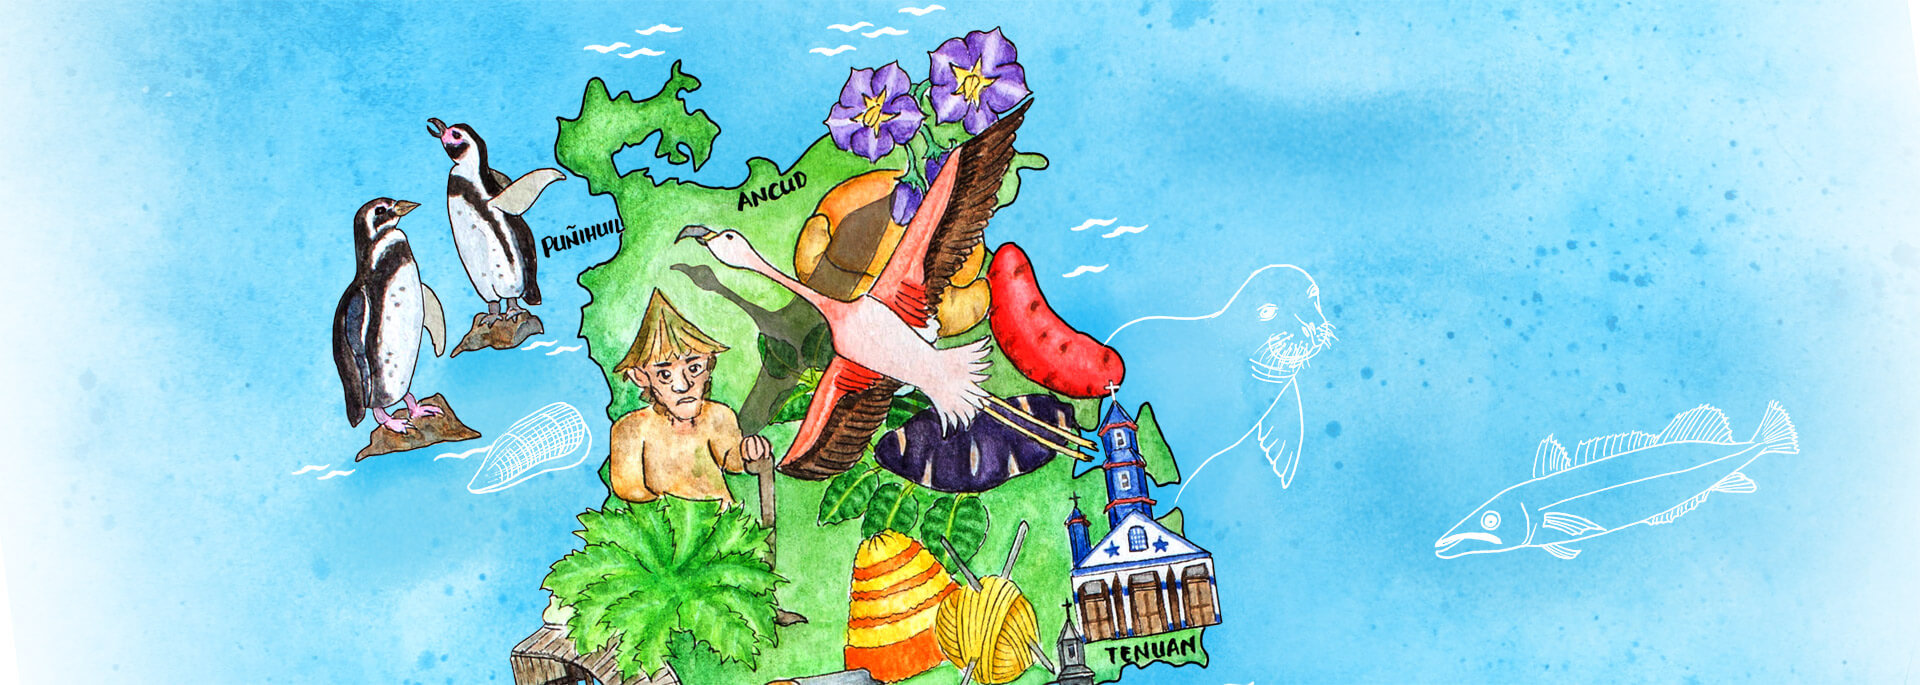 Kalender Illustrierte Inseln 2017 – Oktober: Chiloé